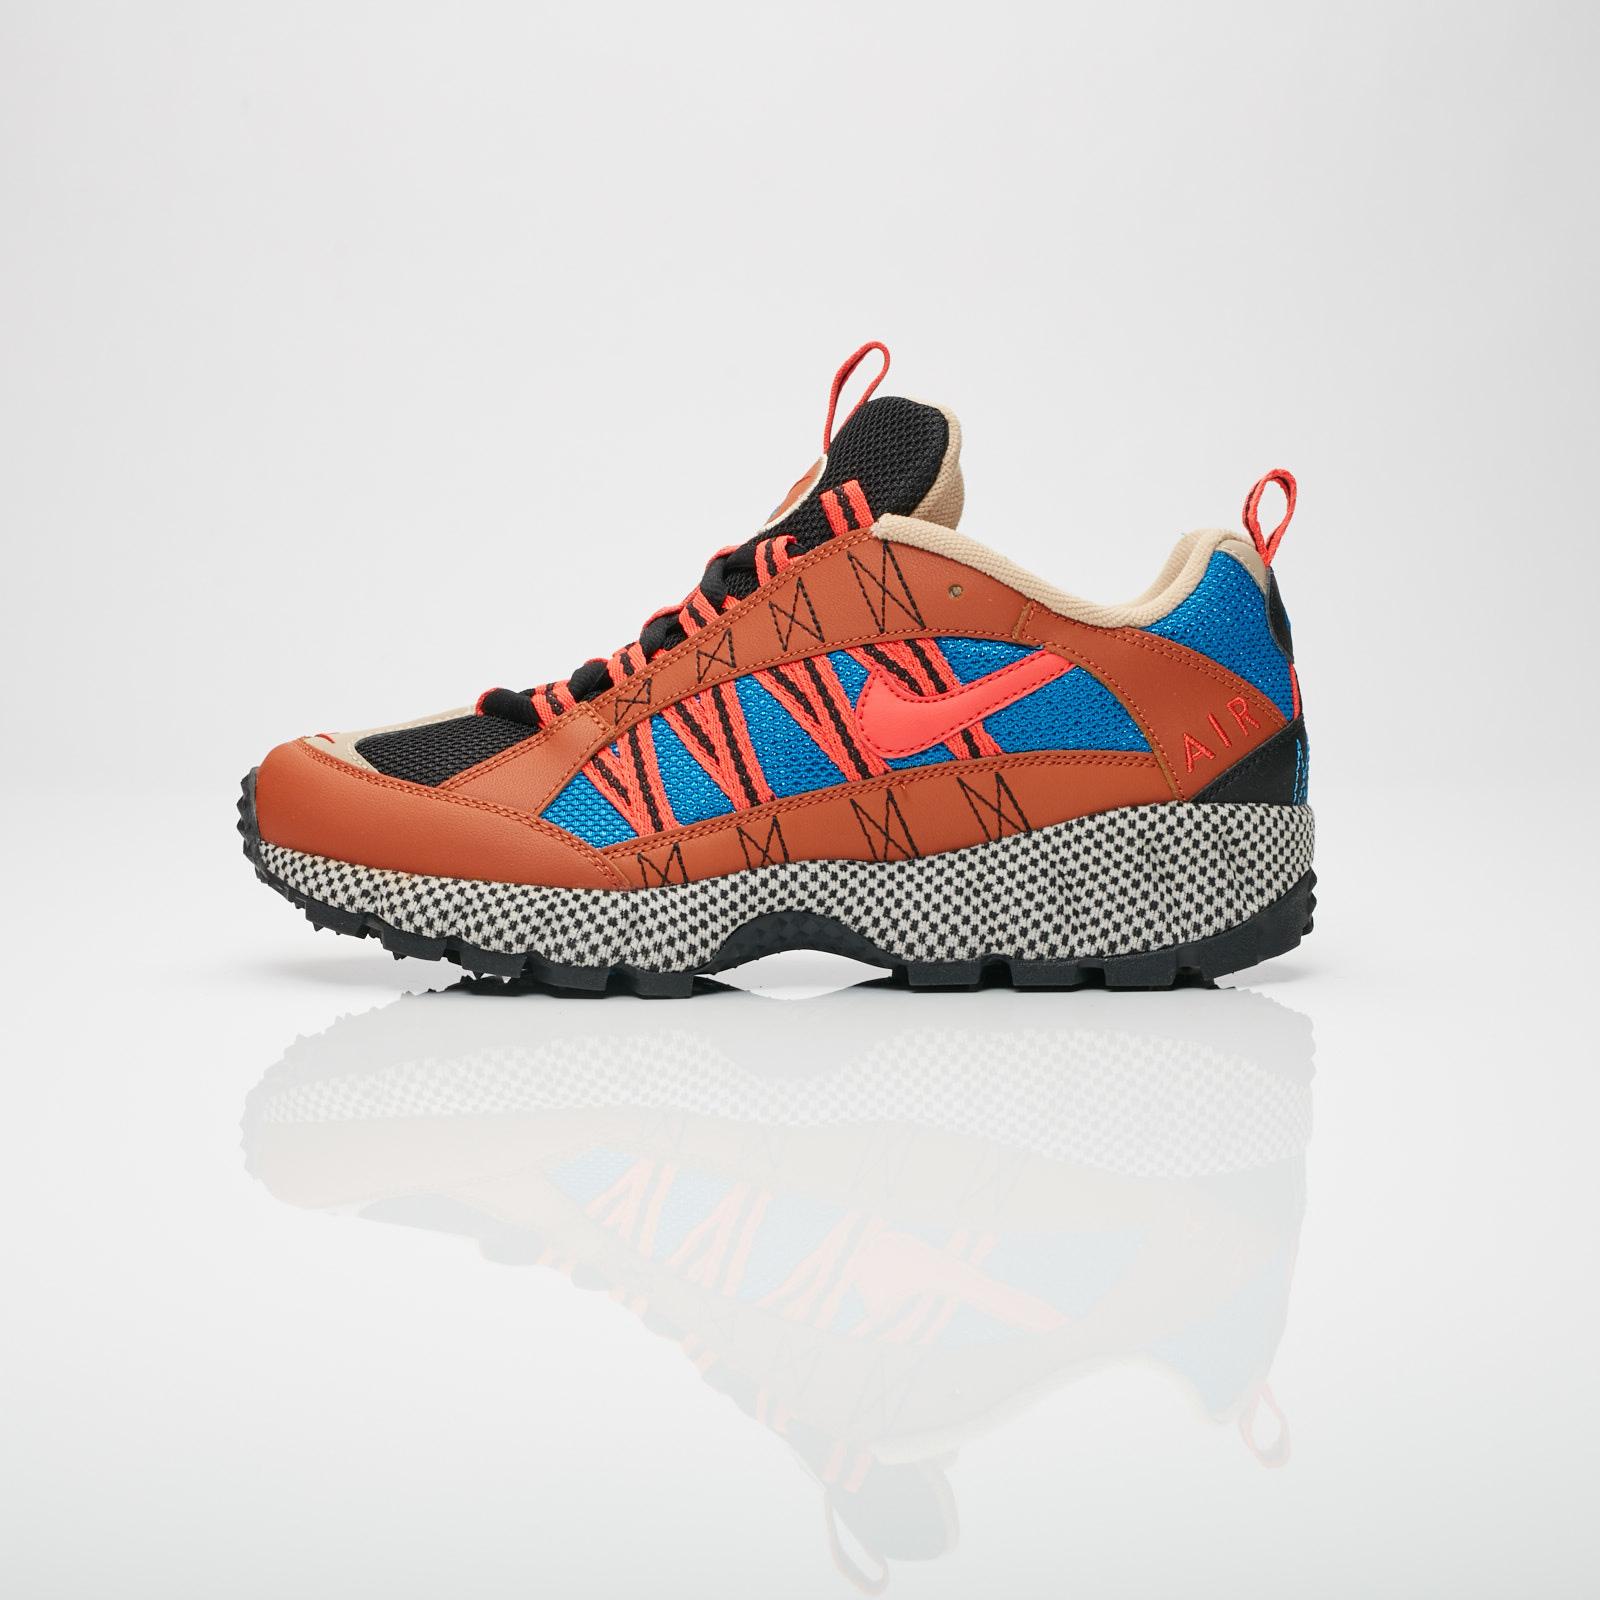 Nike Air Humara 17 QS - Ao3297-200 - Sneakersnstuff  d8c885af8